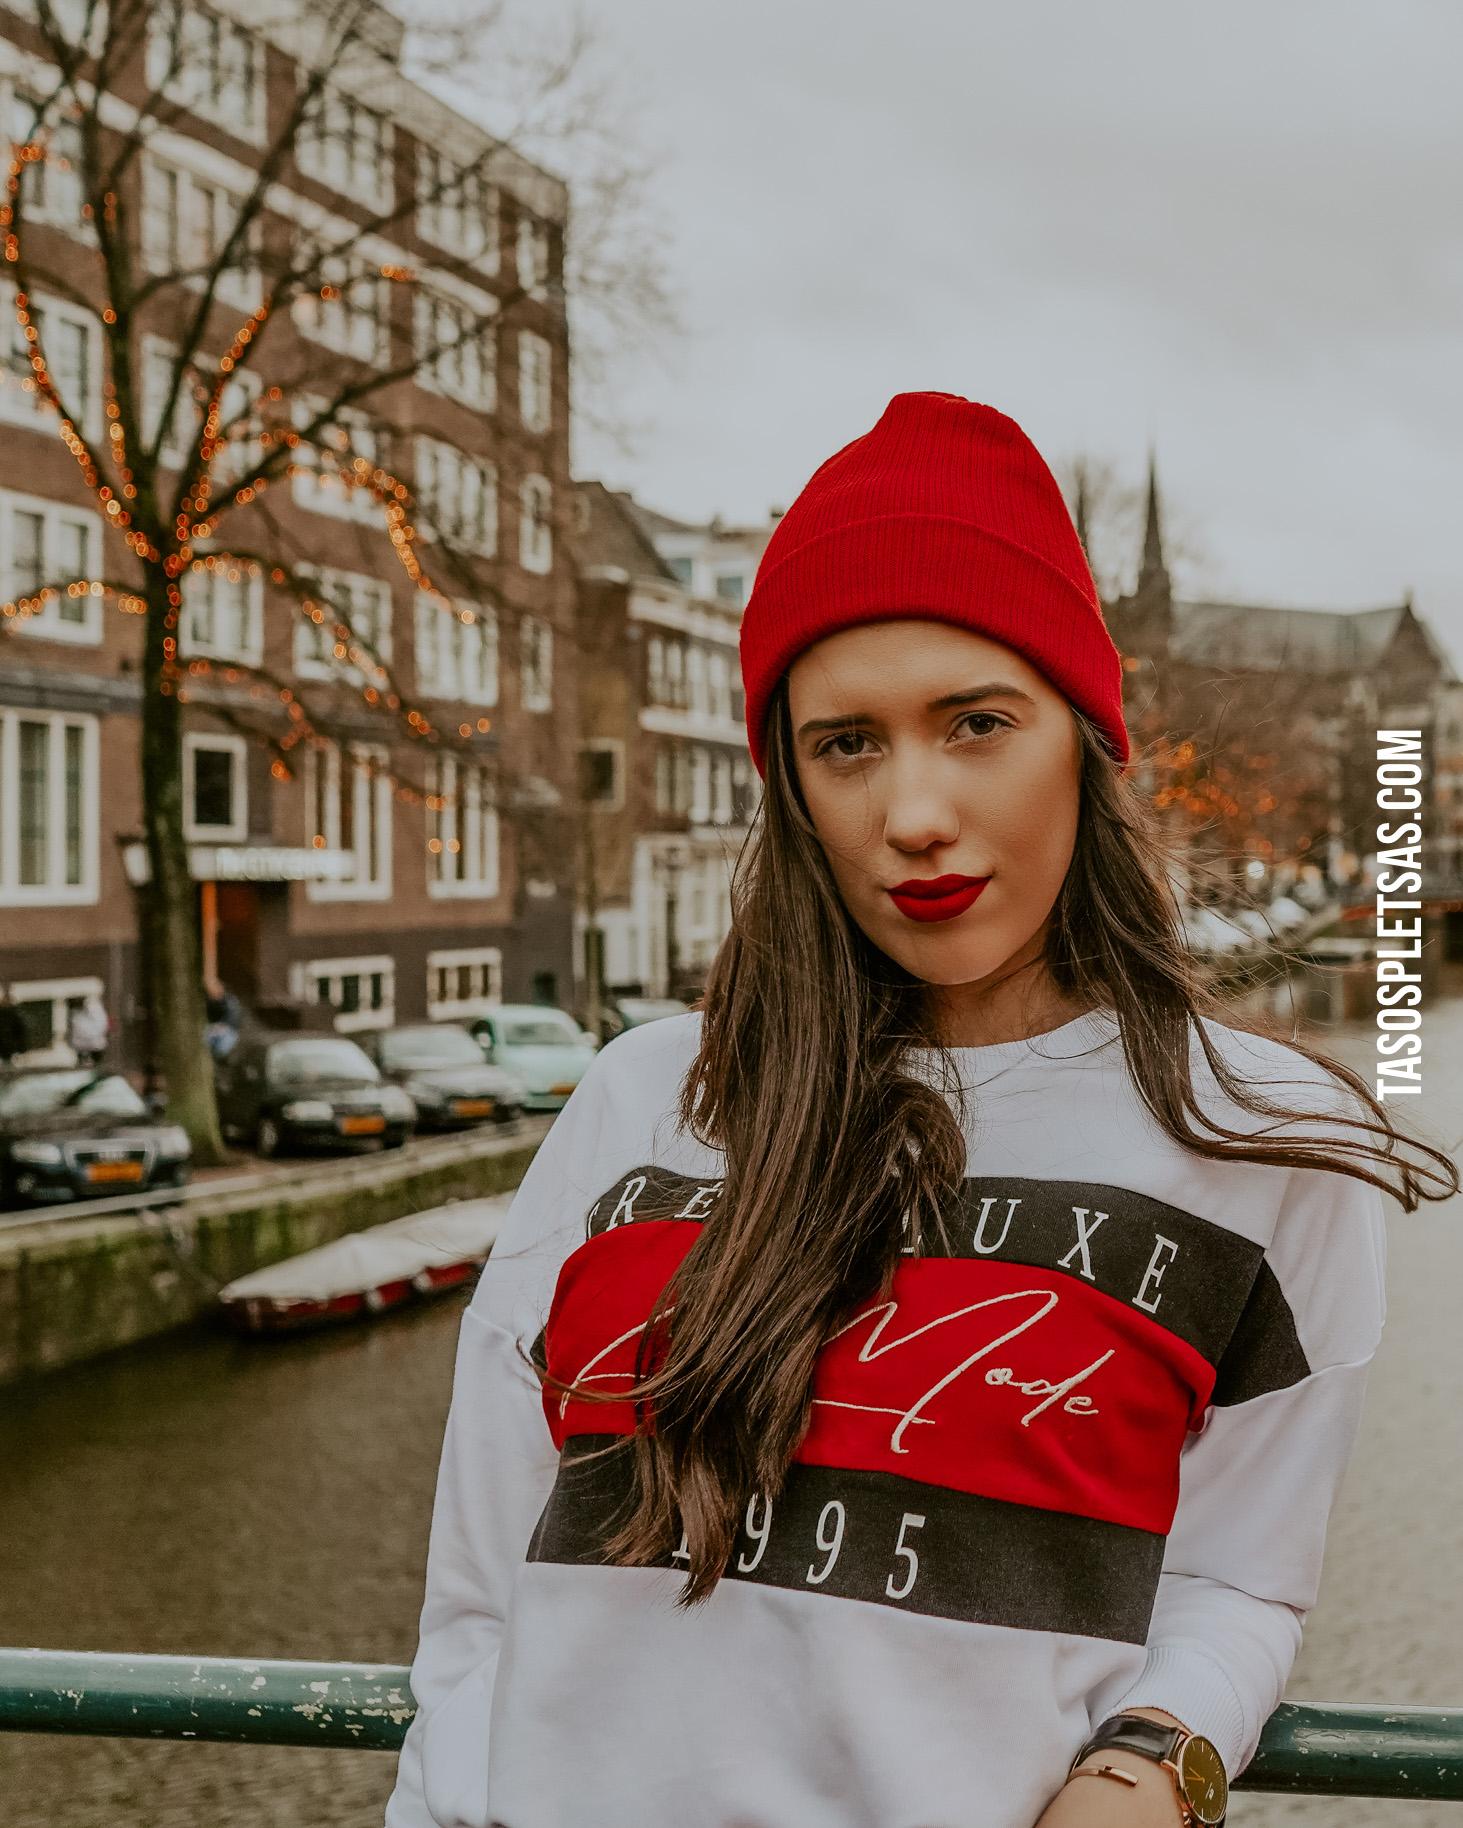 WEBSITE-Amsterdam-DSC00568 copy.jpg